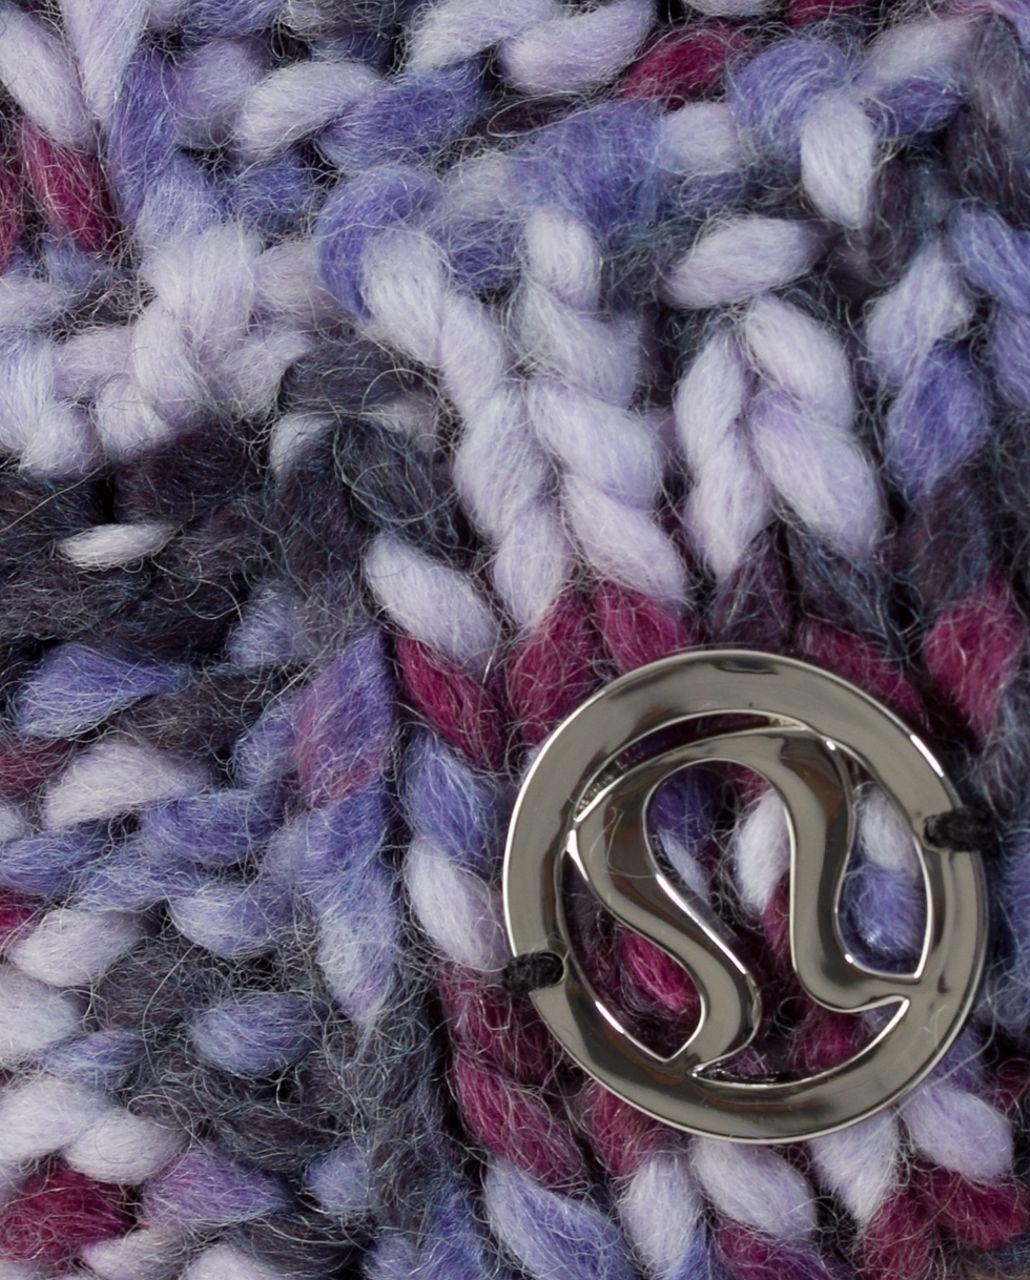 Lululemon Toasty Toque - Black Swan Lilac Persian Purple Plum Space Dye